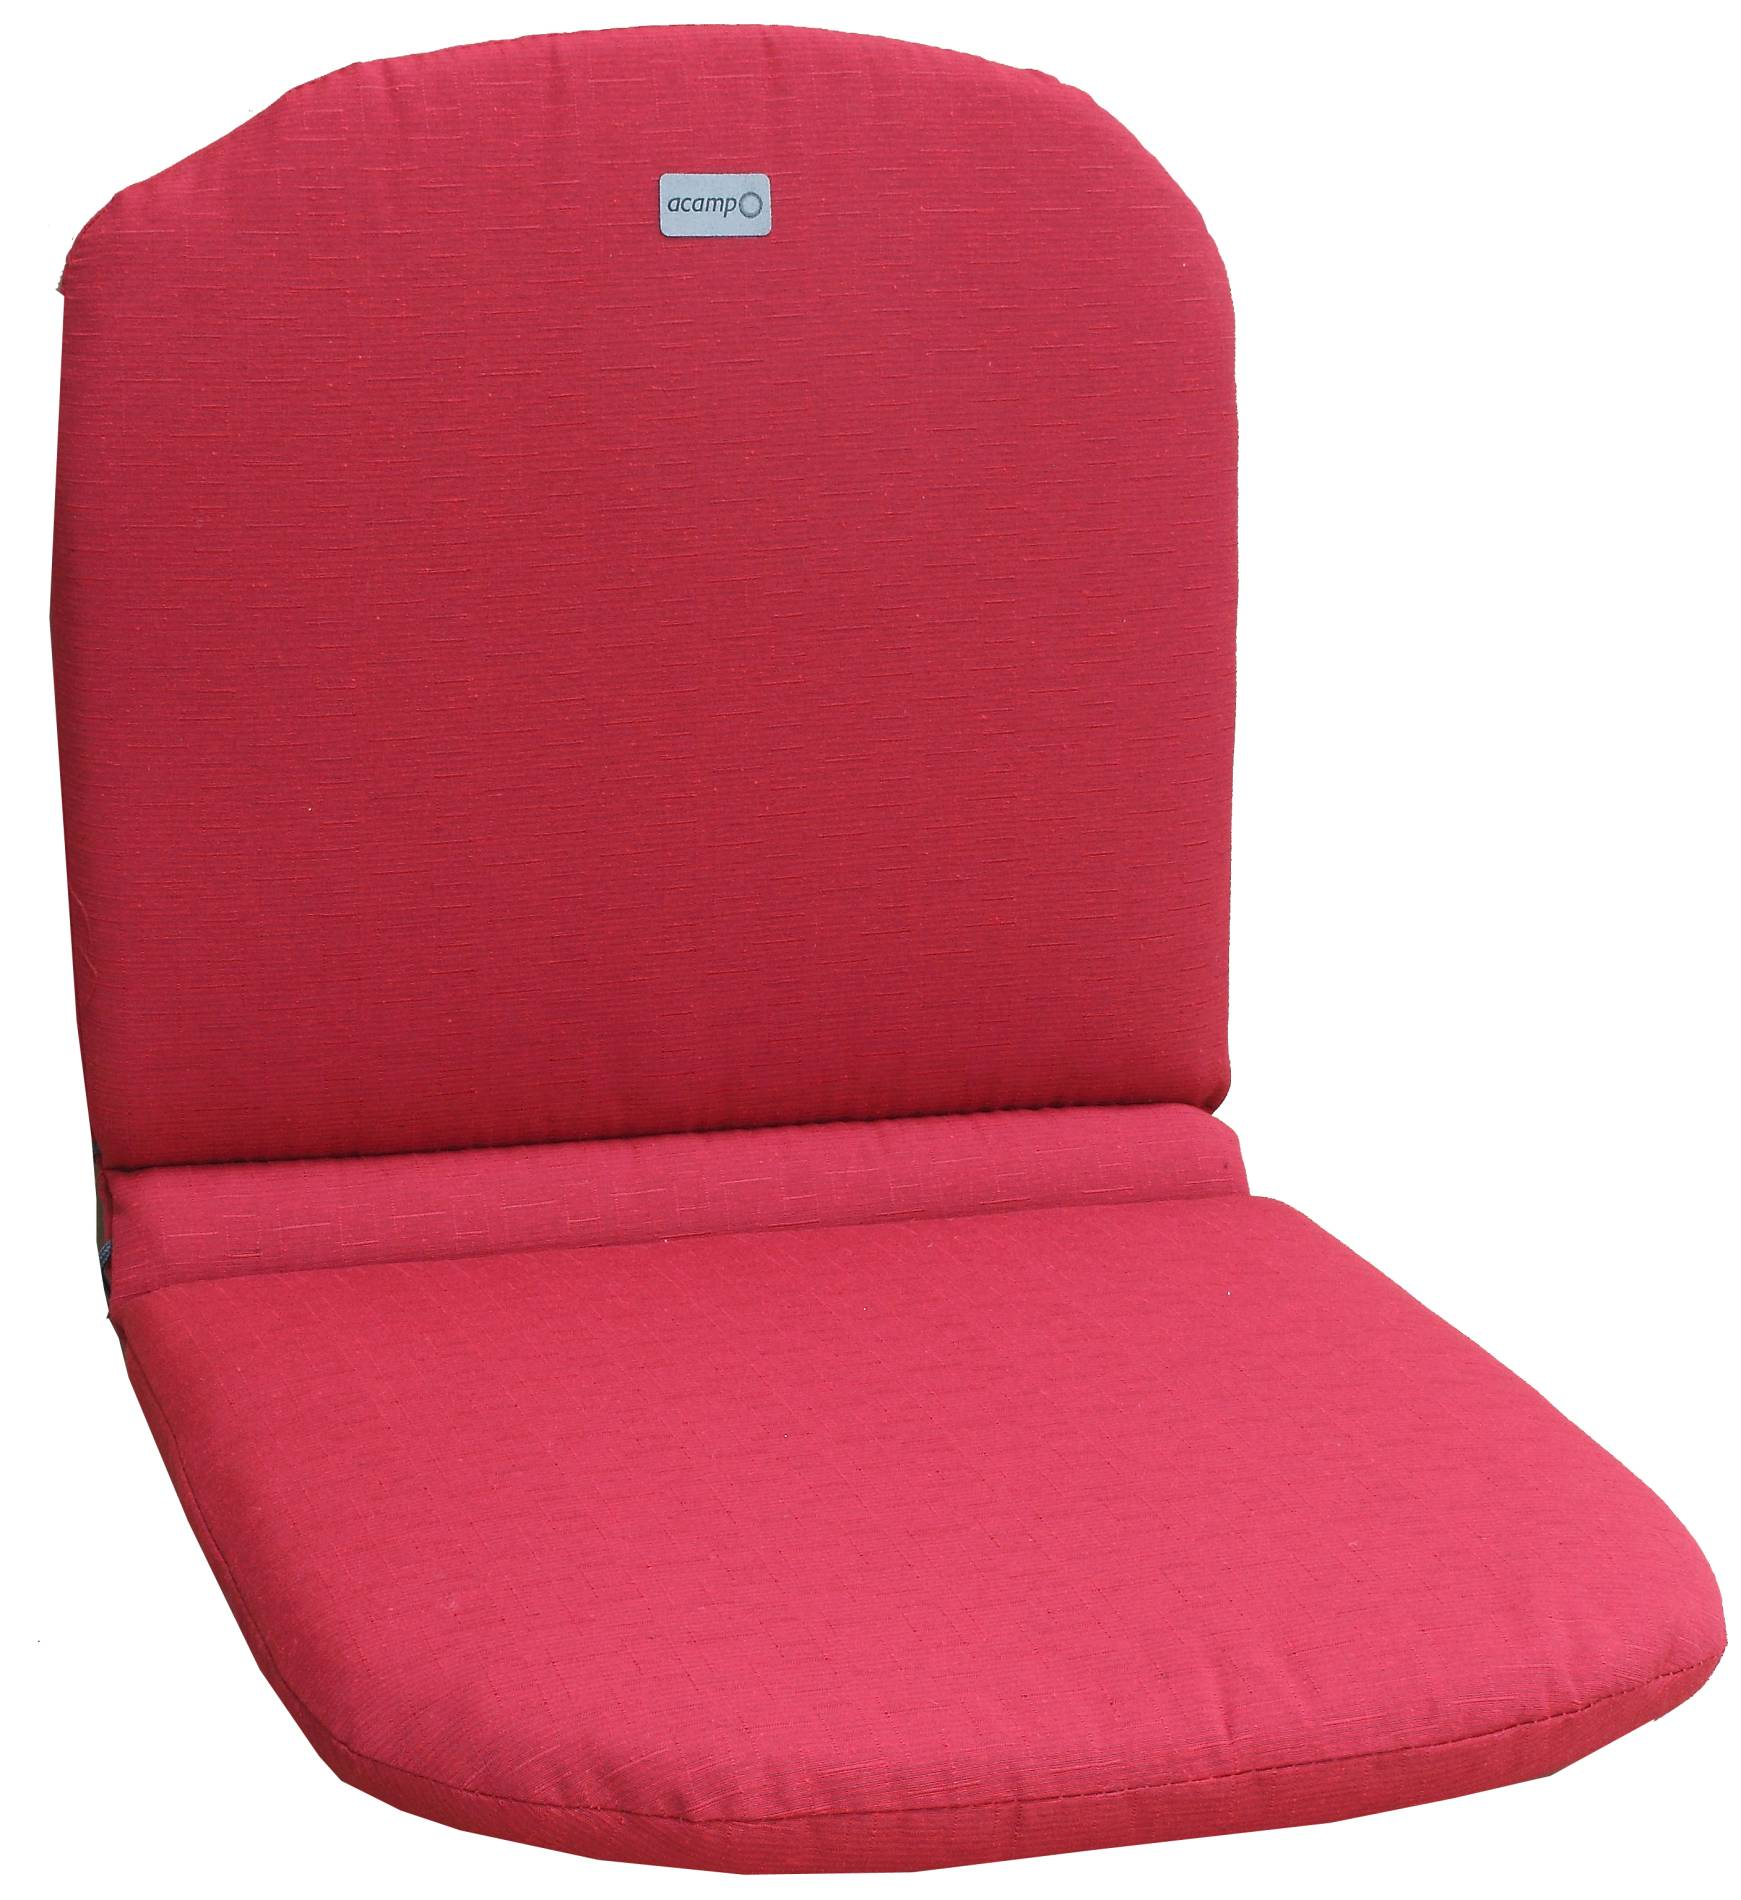 acamp Sesselkissen rot Typ-C 85 x 44 x 4 cm passend für Stapelsessel Alfredo